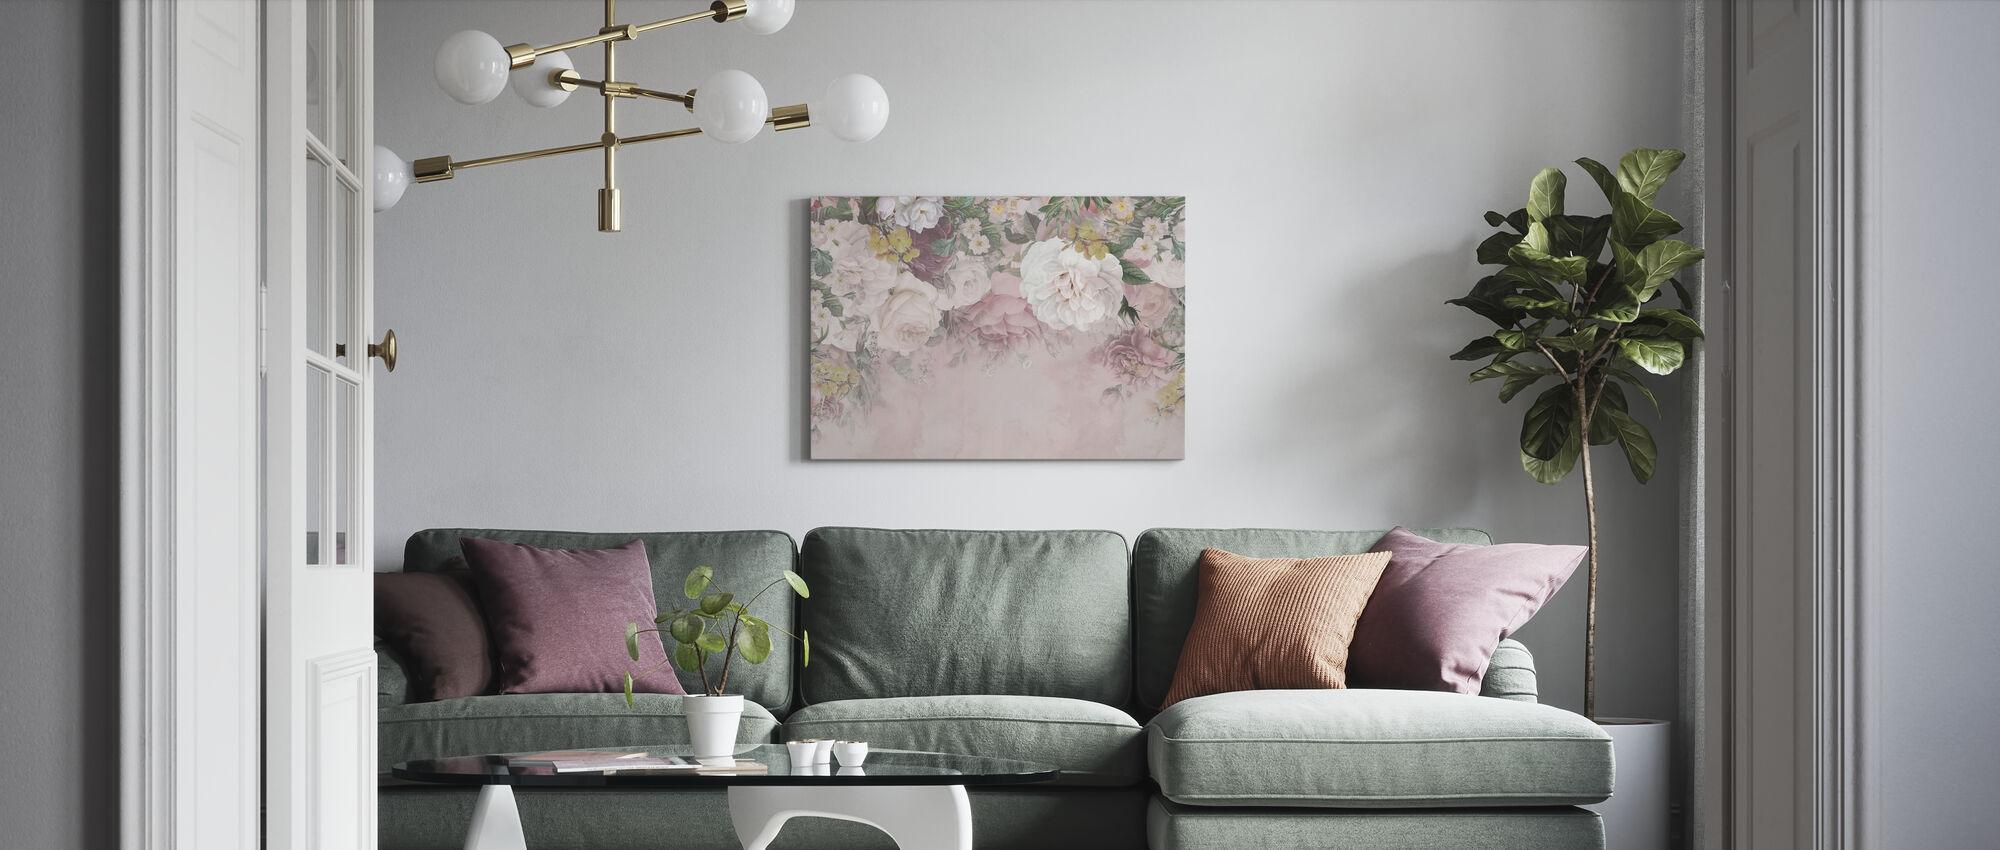 Gentle Flowers - Canvas print - Living Room